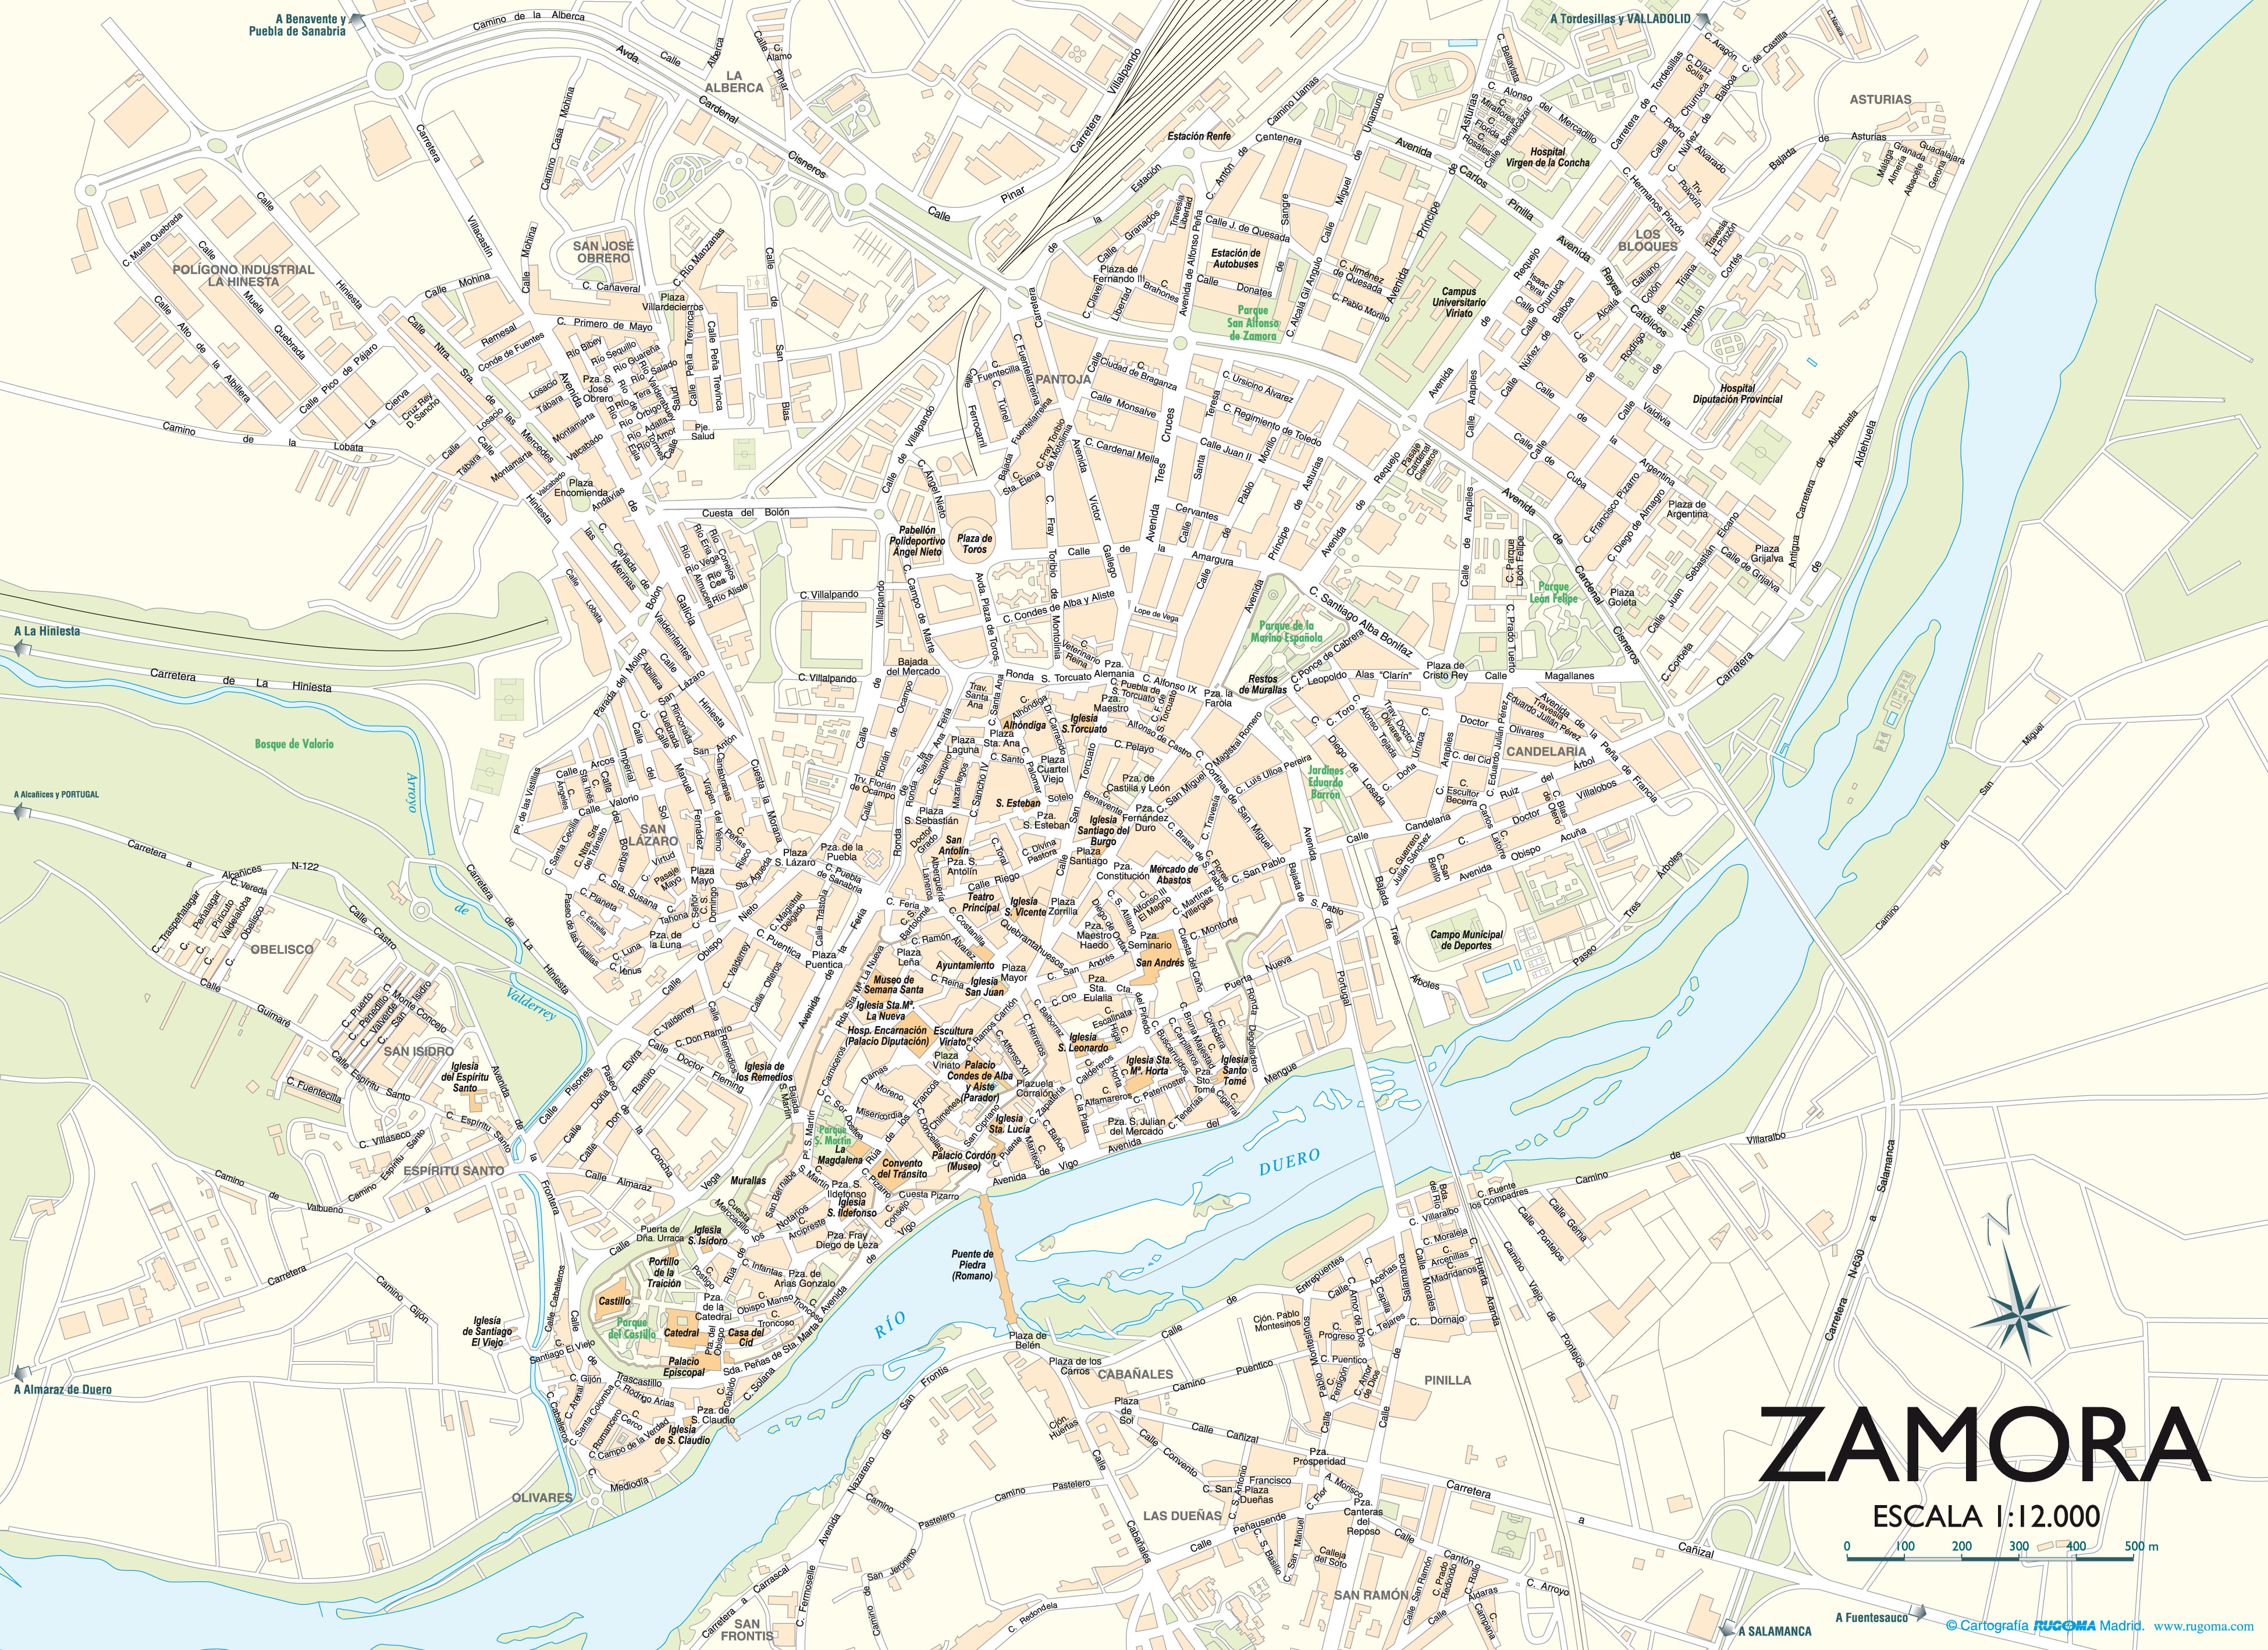 Mapa de Zamora